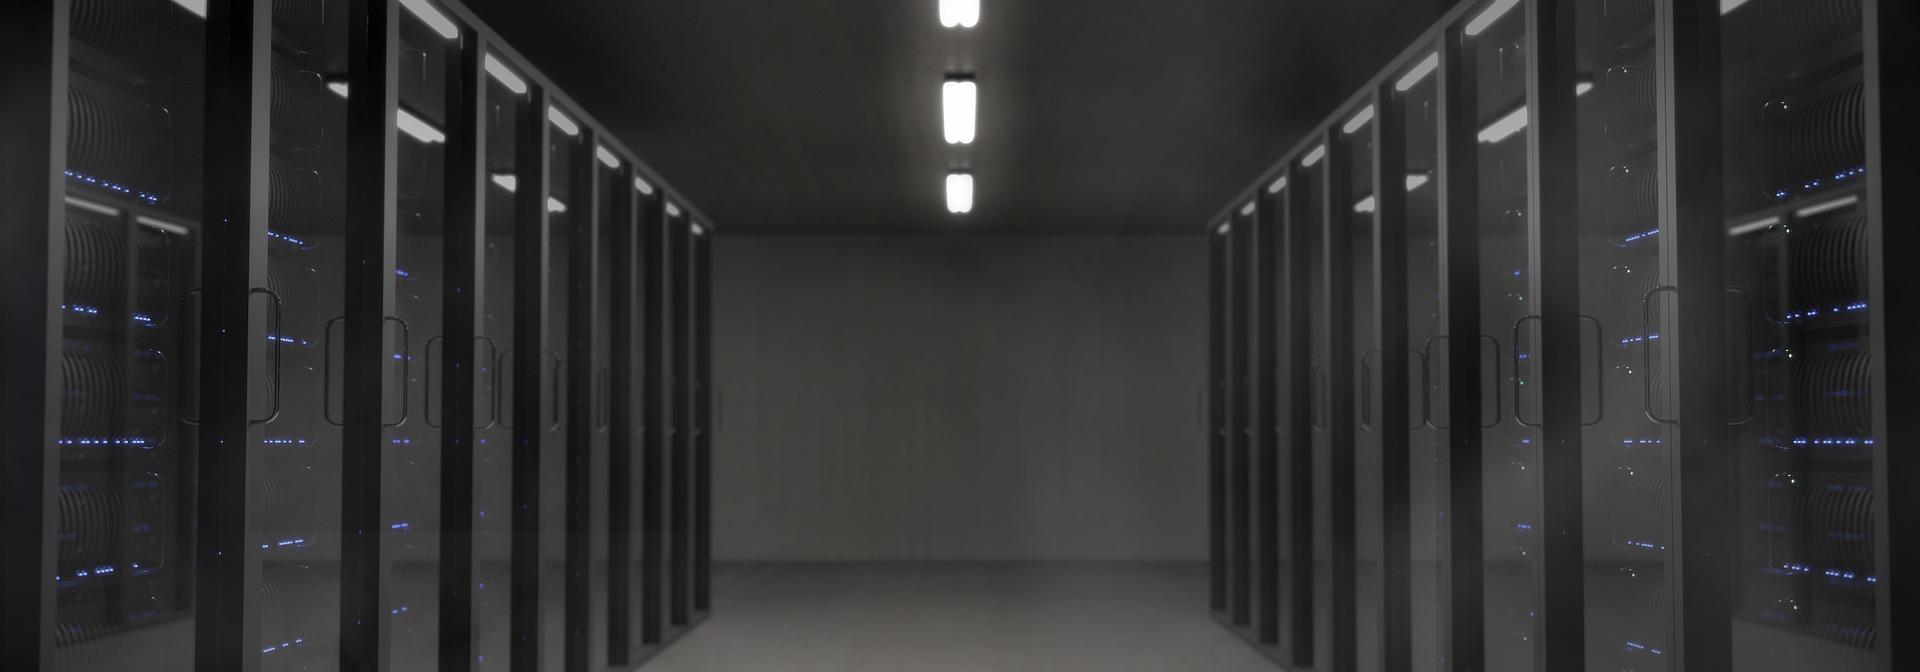 server-2160321_1920